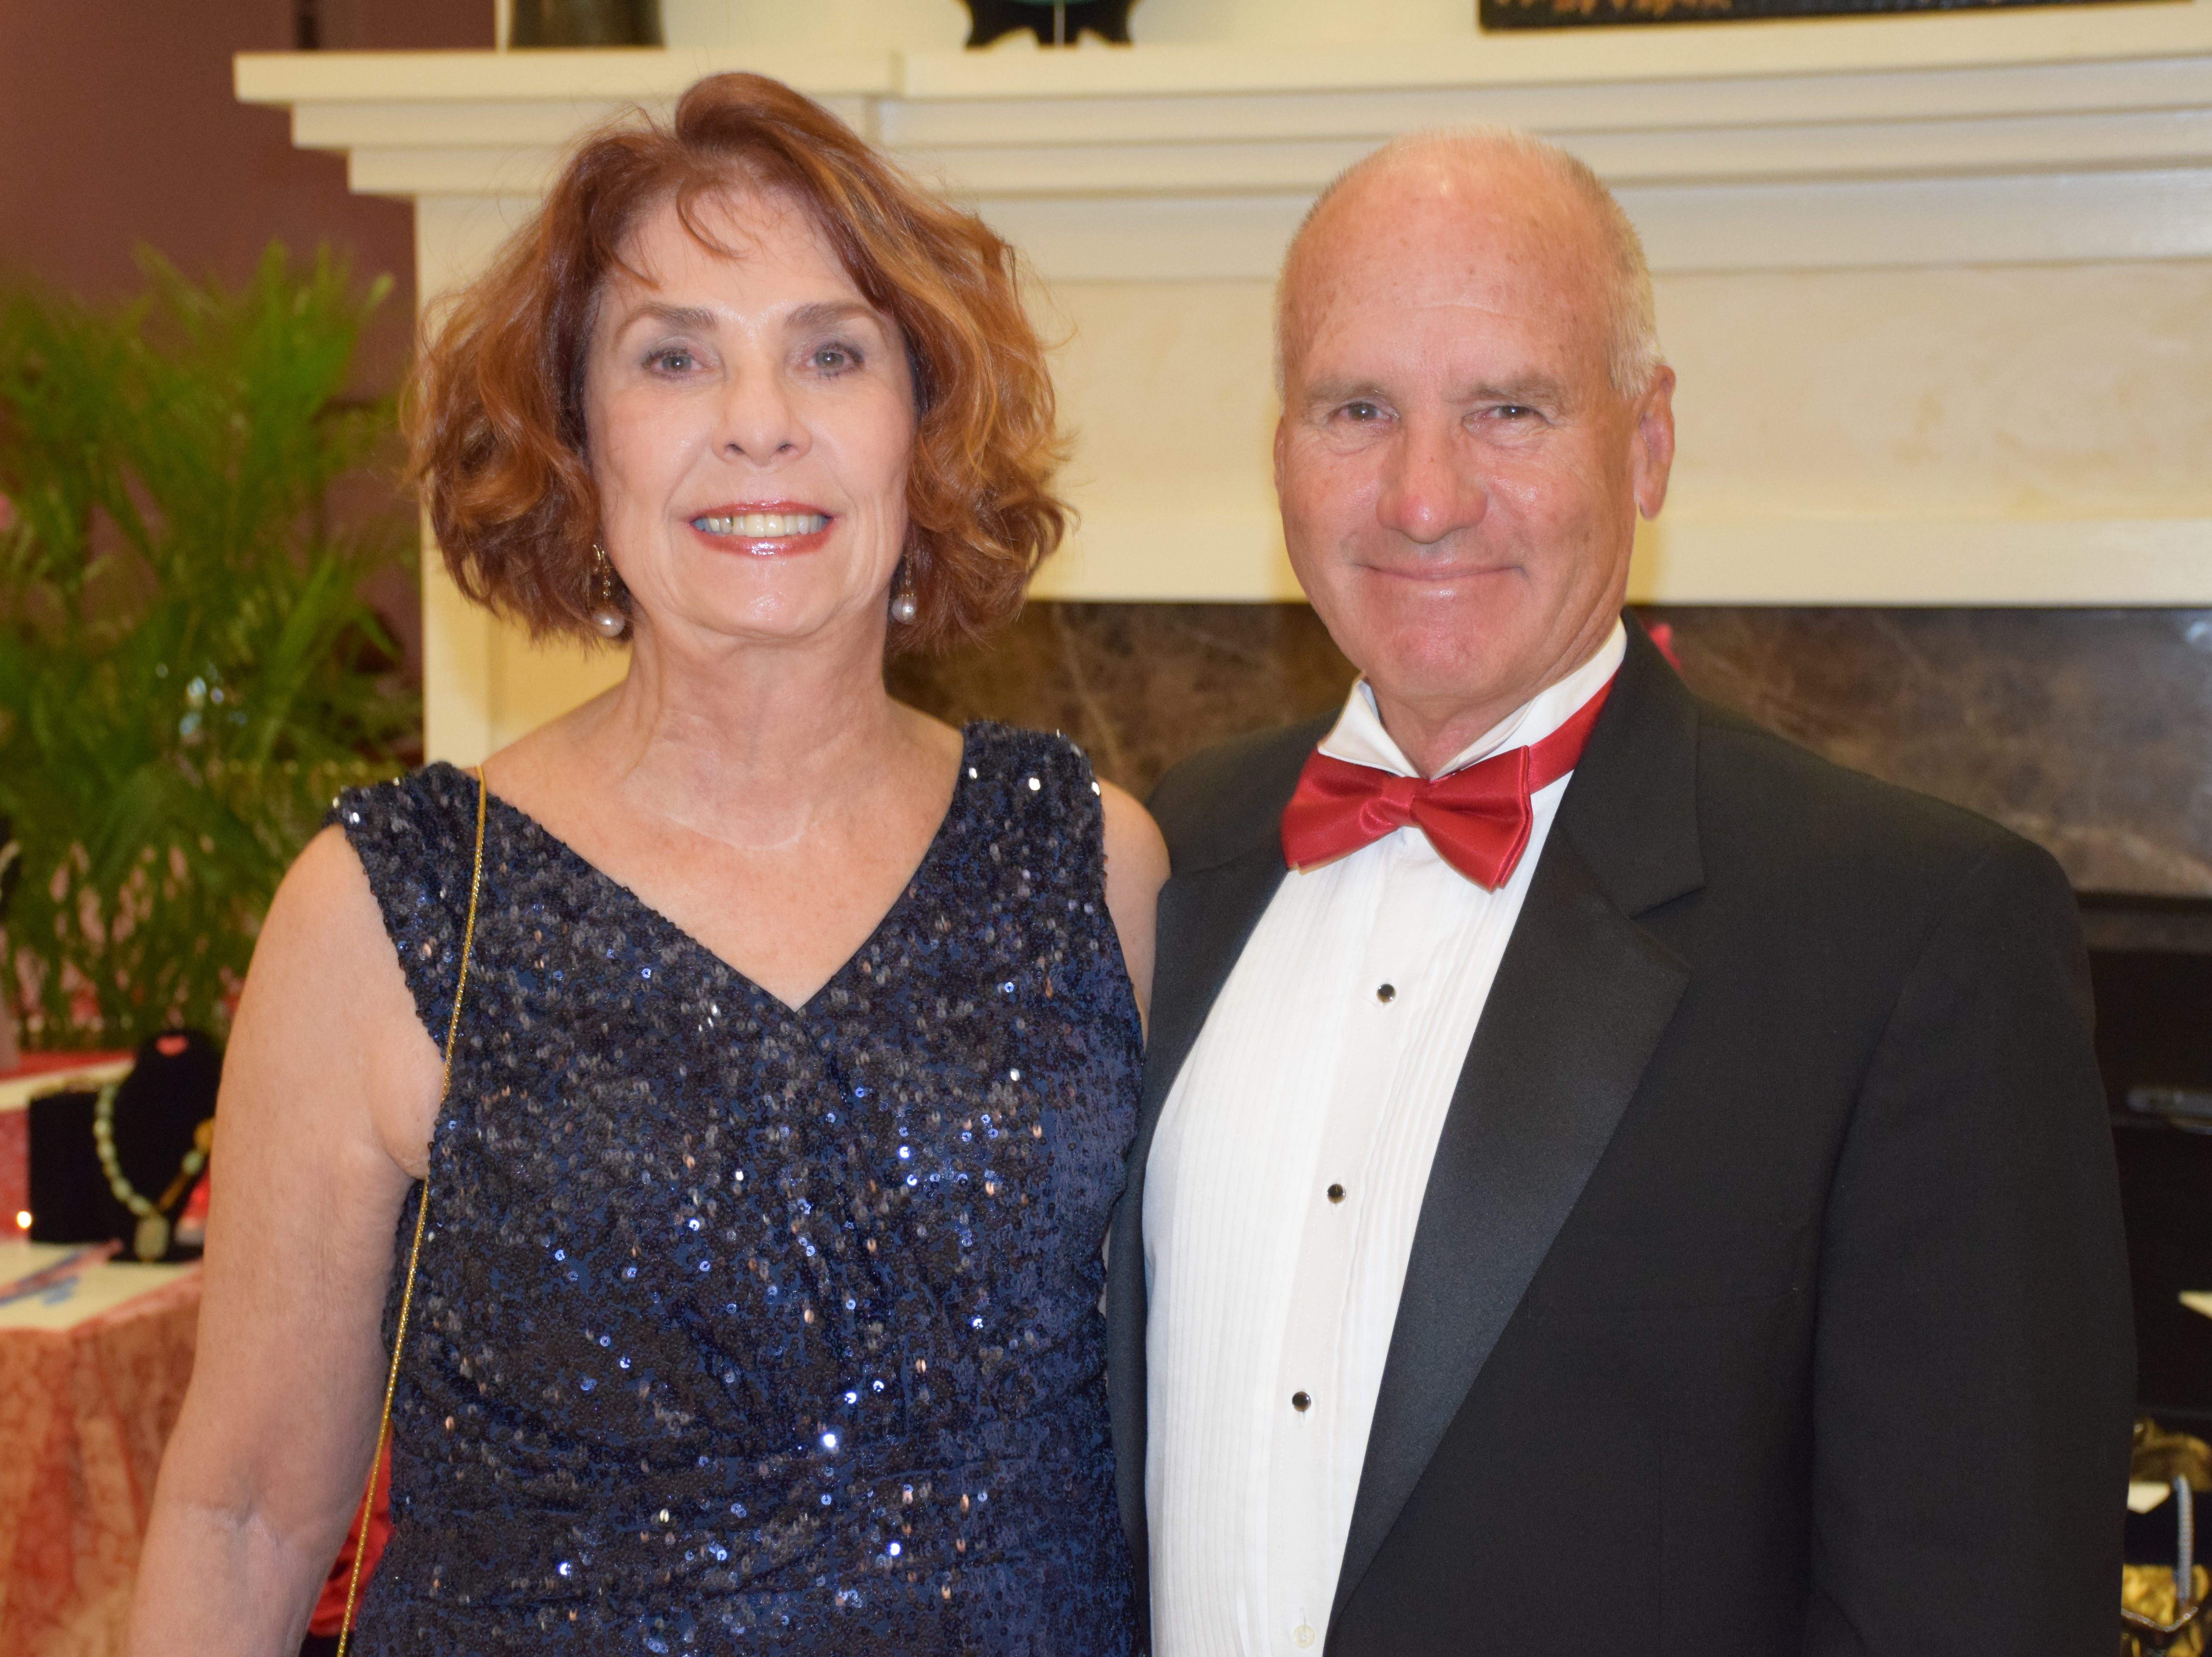 Susan Kamer and Don Reeser